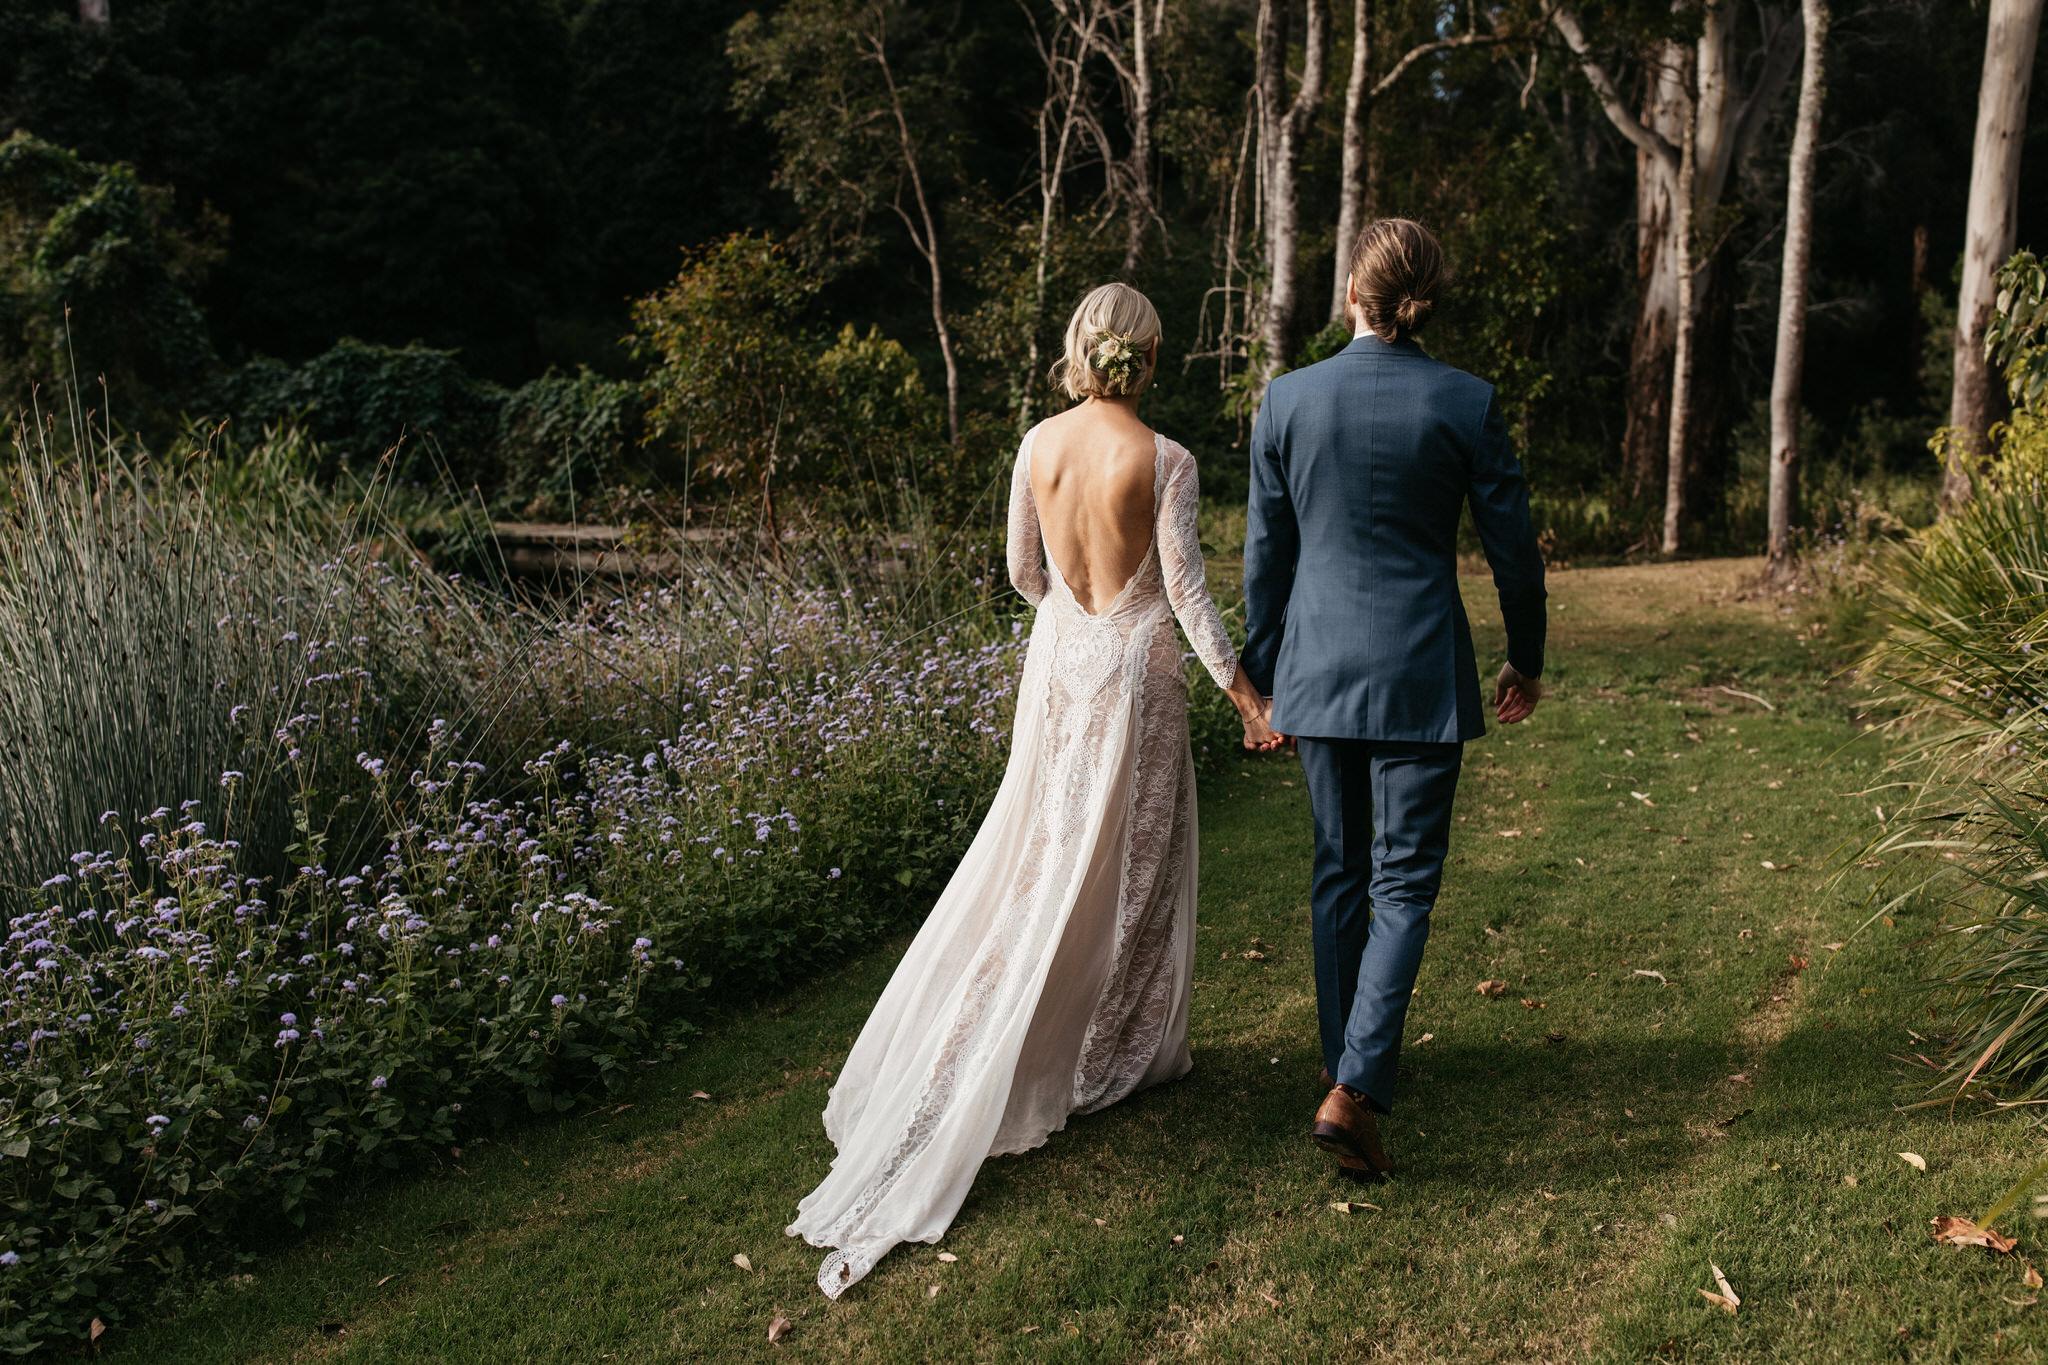 067_SBA-Jen-Tom-Wedding-228_Sunshine_Coast_wedding_photographer.jpg